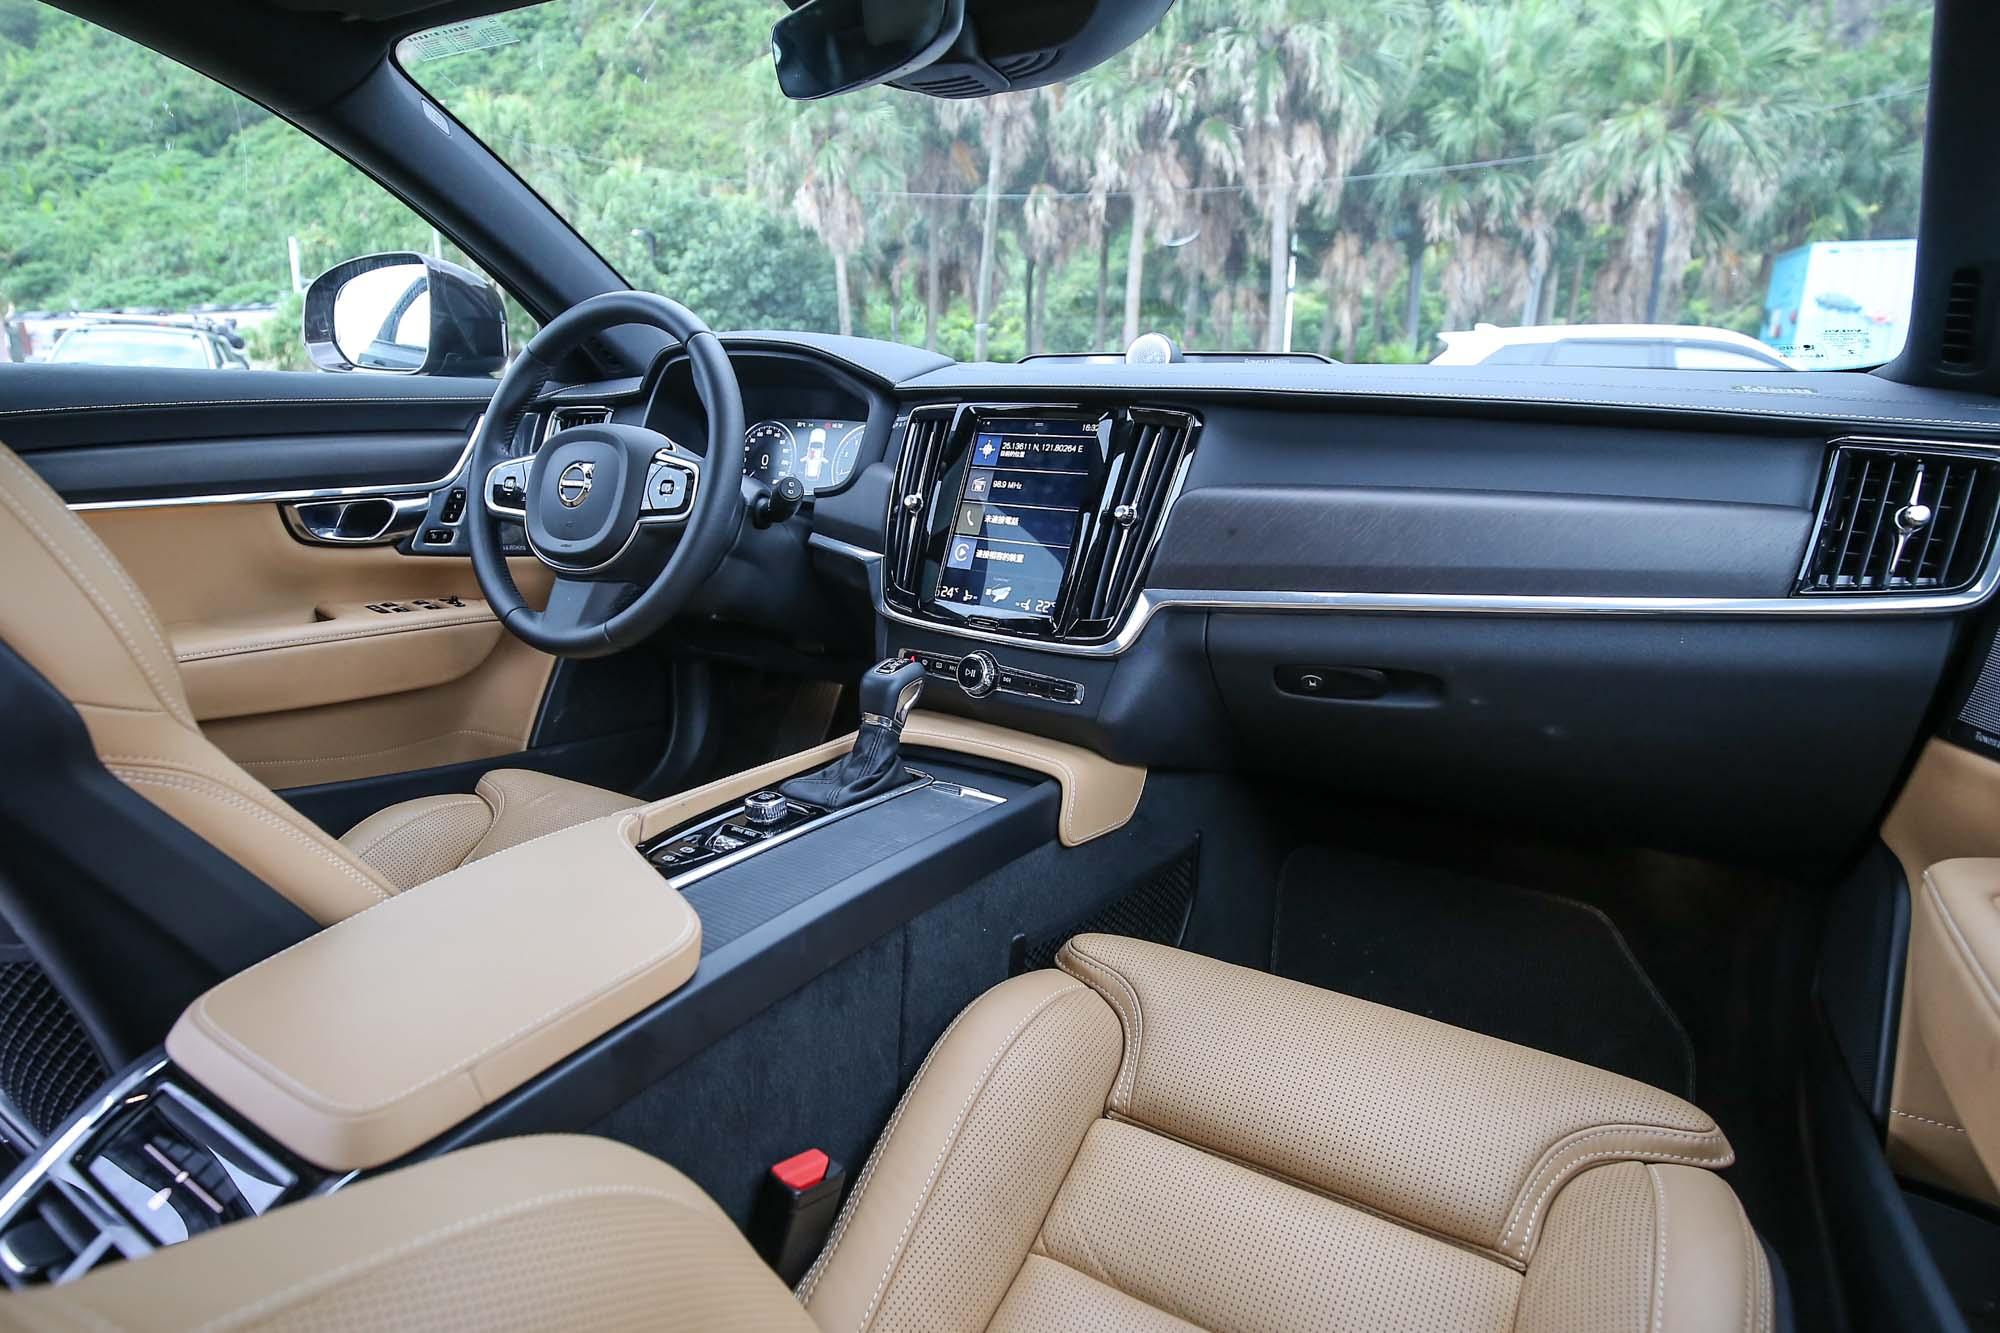 V90 Cross Country 車系皆採用 Black Walnut 黑胡桃木嵌飾內裝鋪陳。